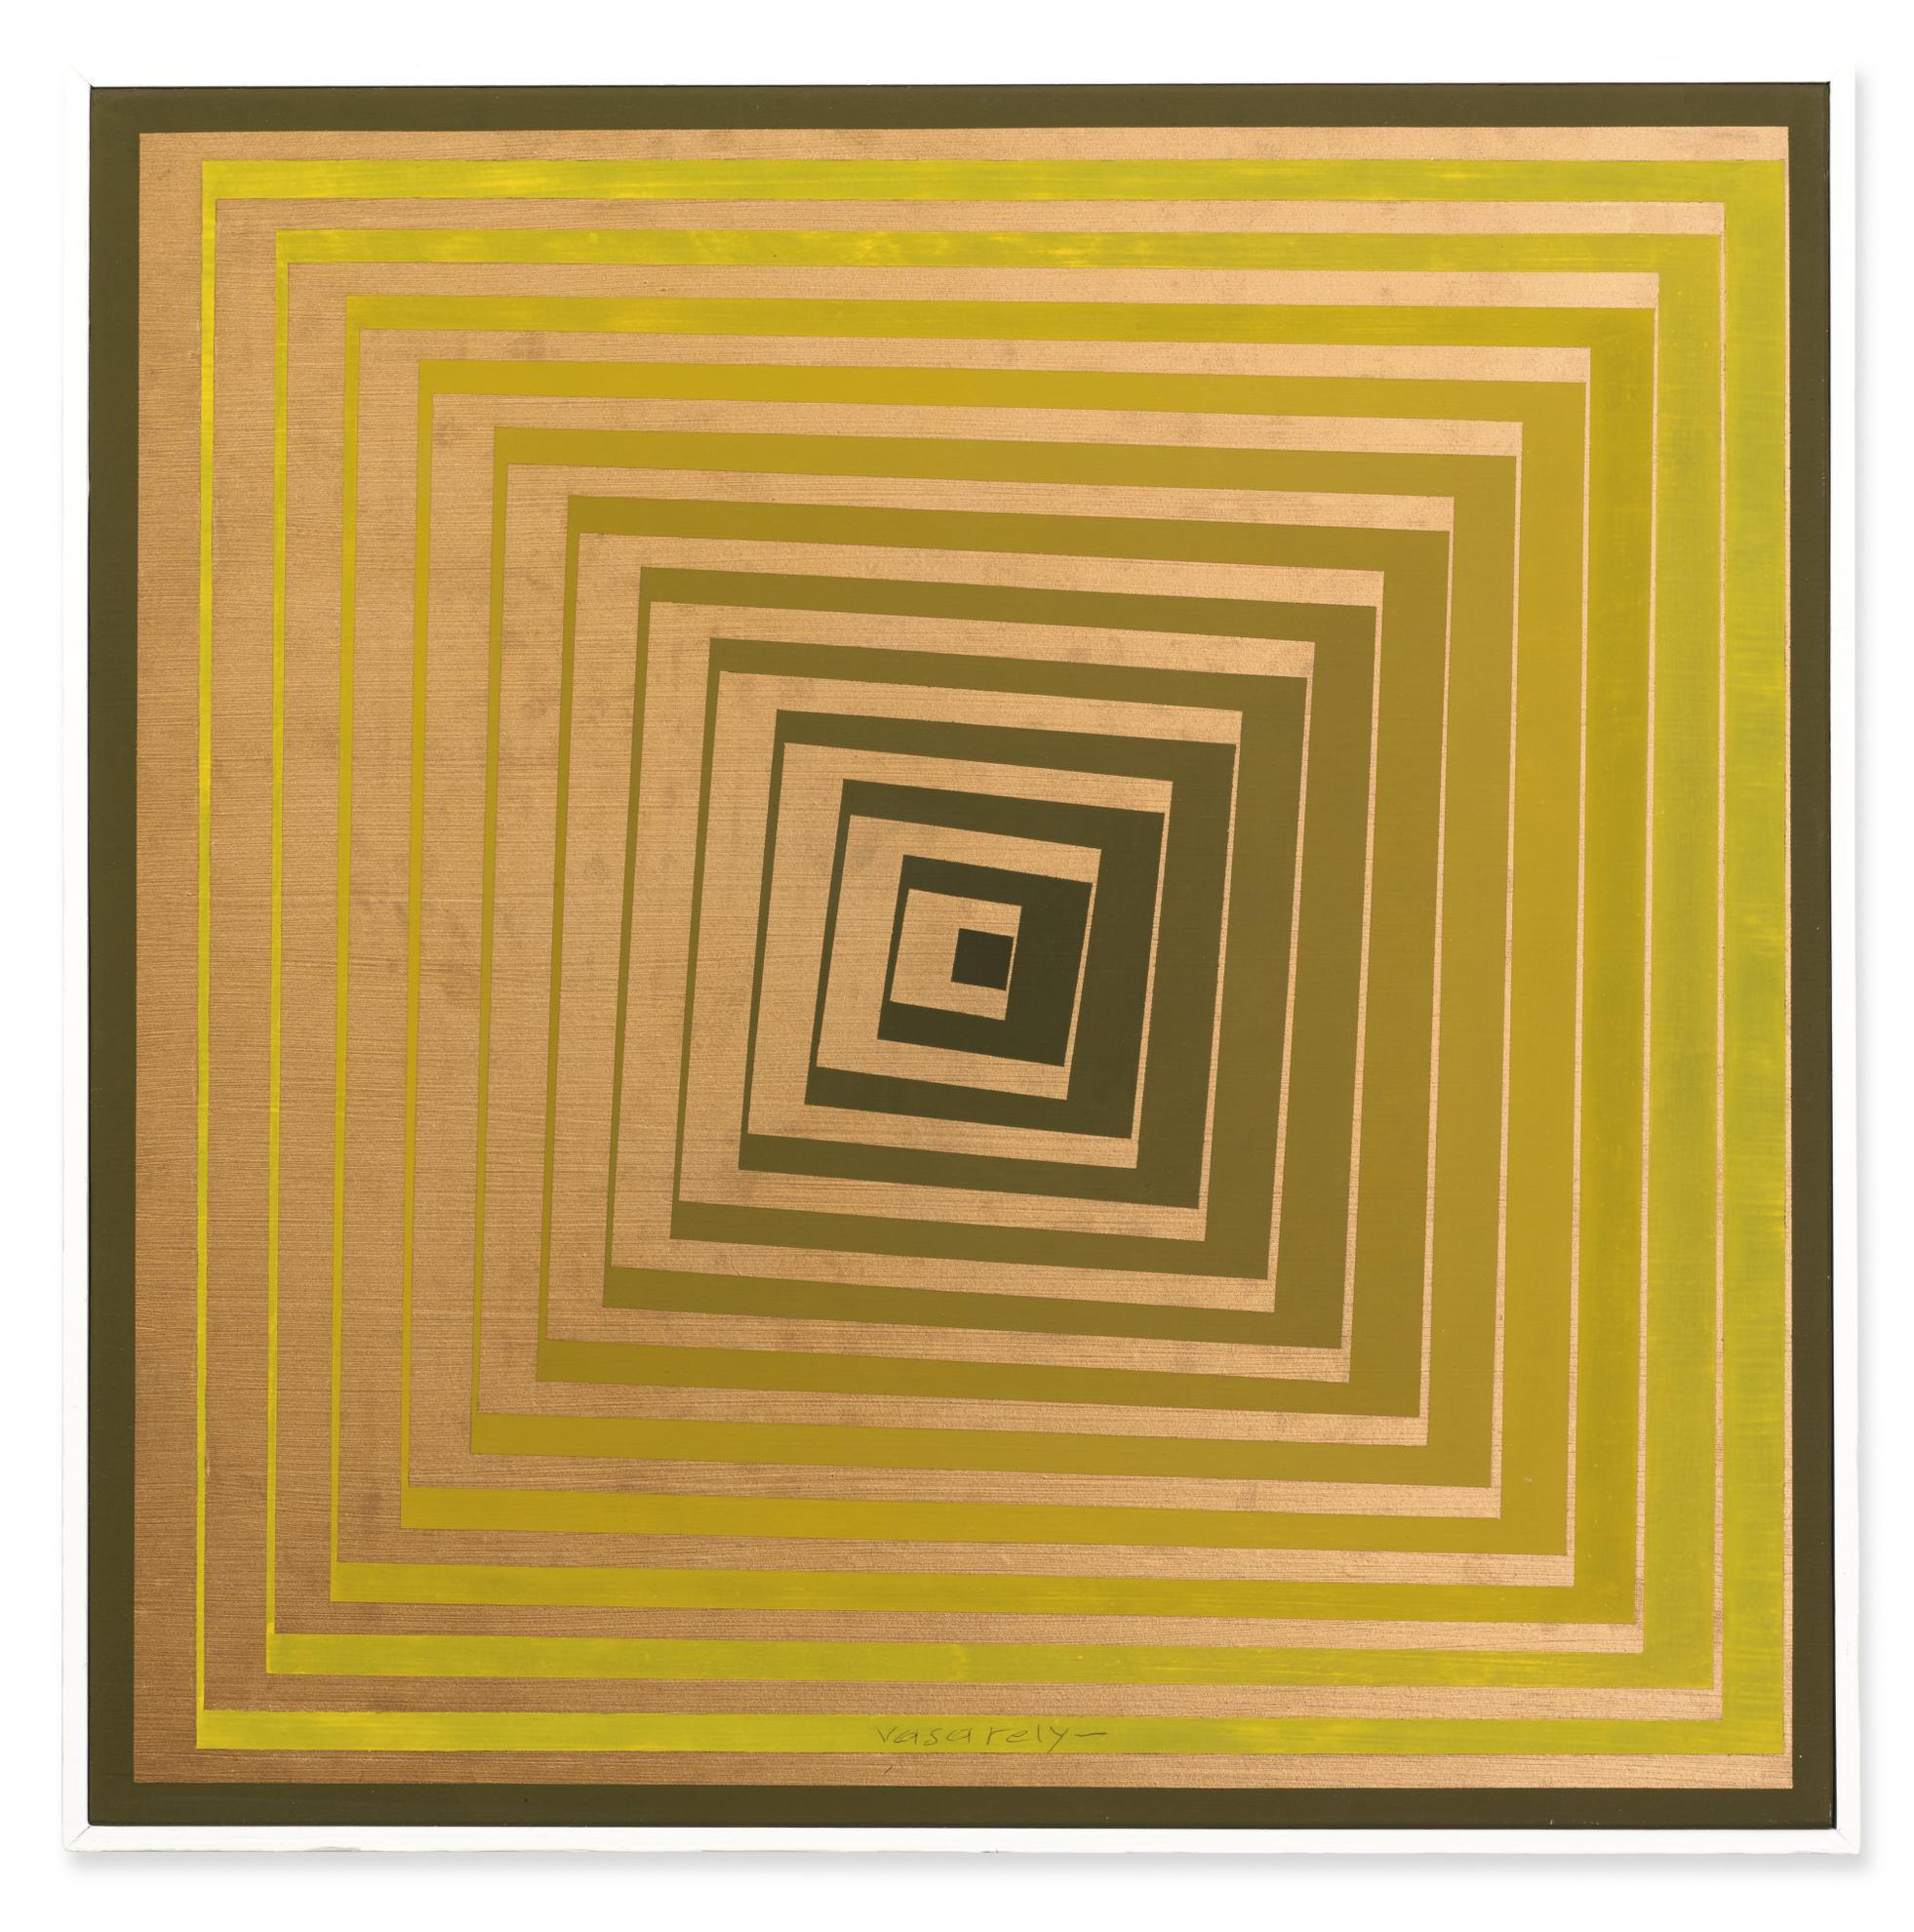 Victor Vasarely-Vonal Or-1968